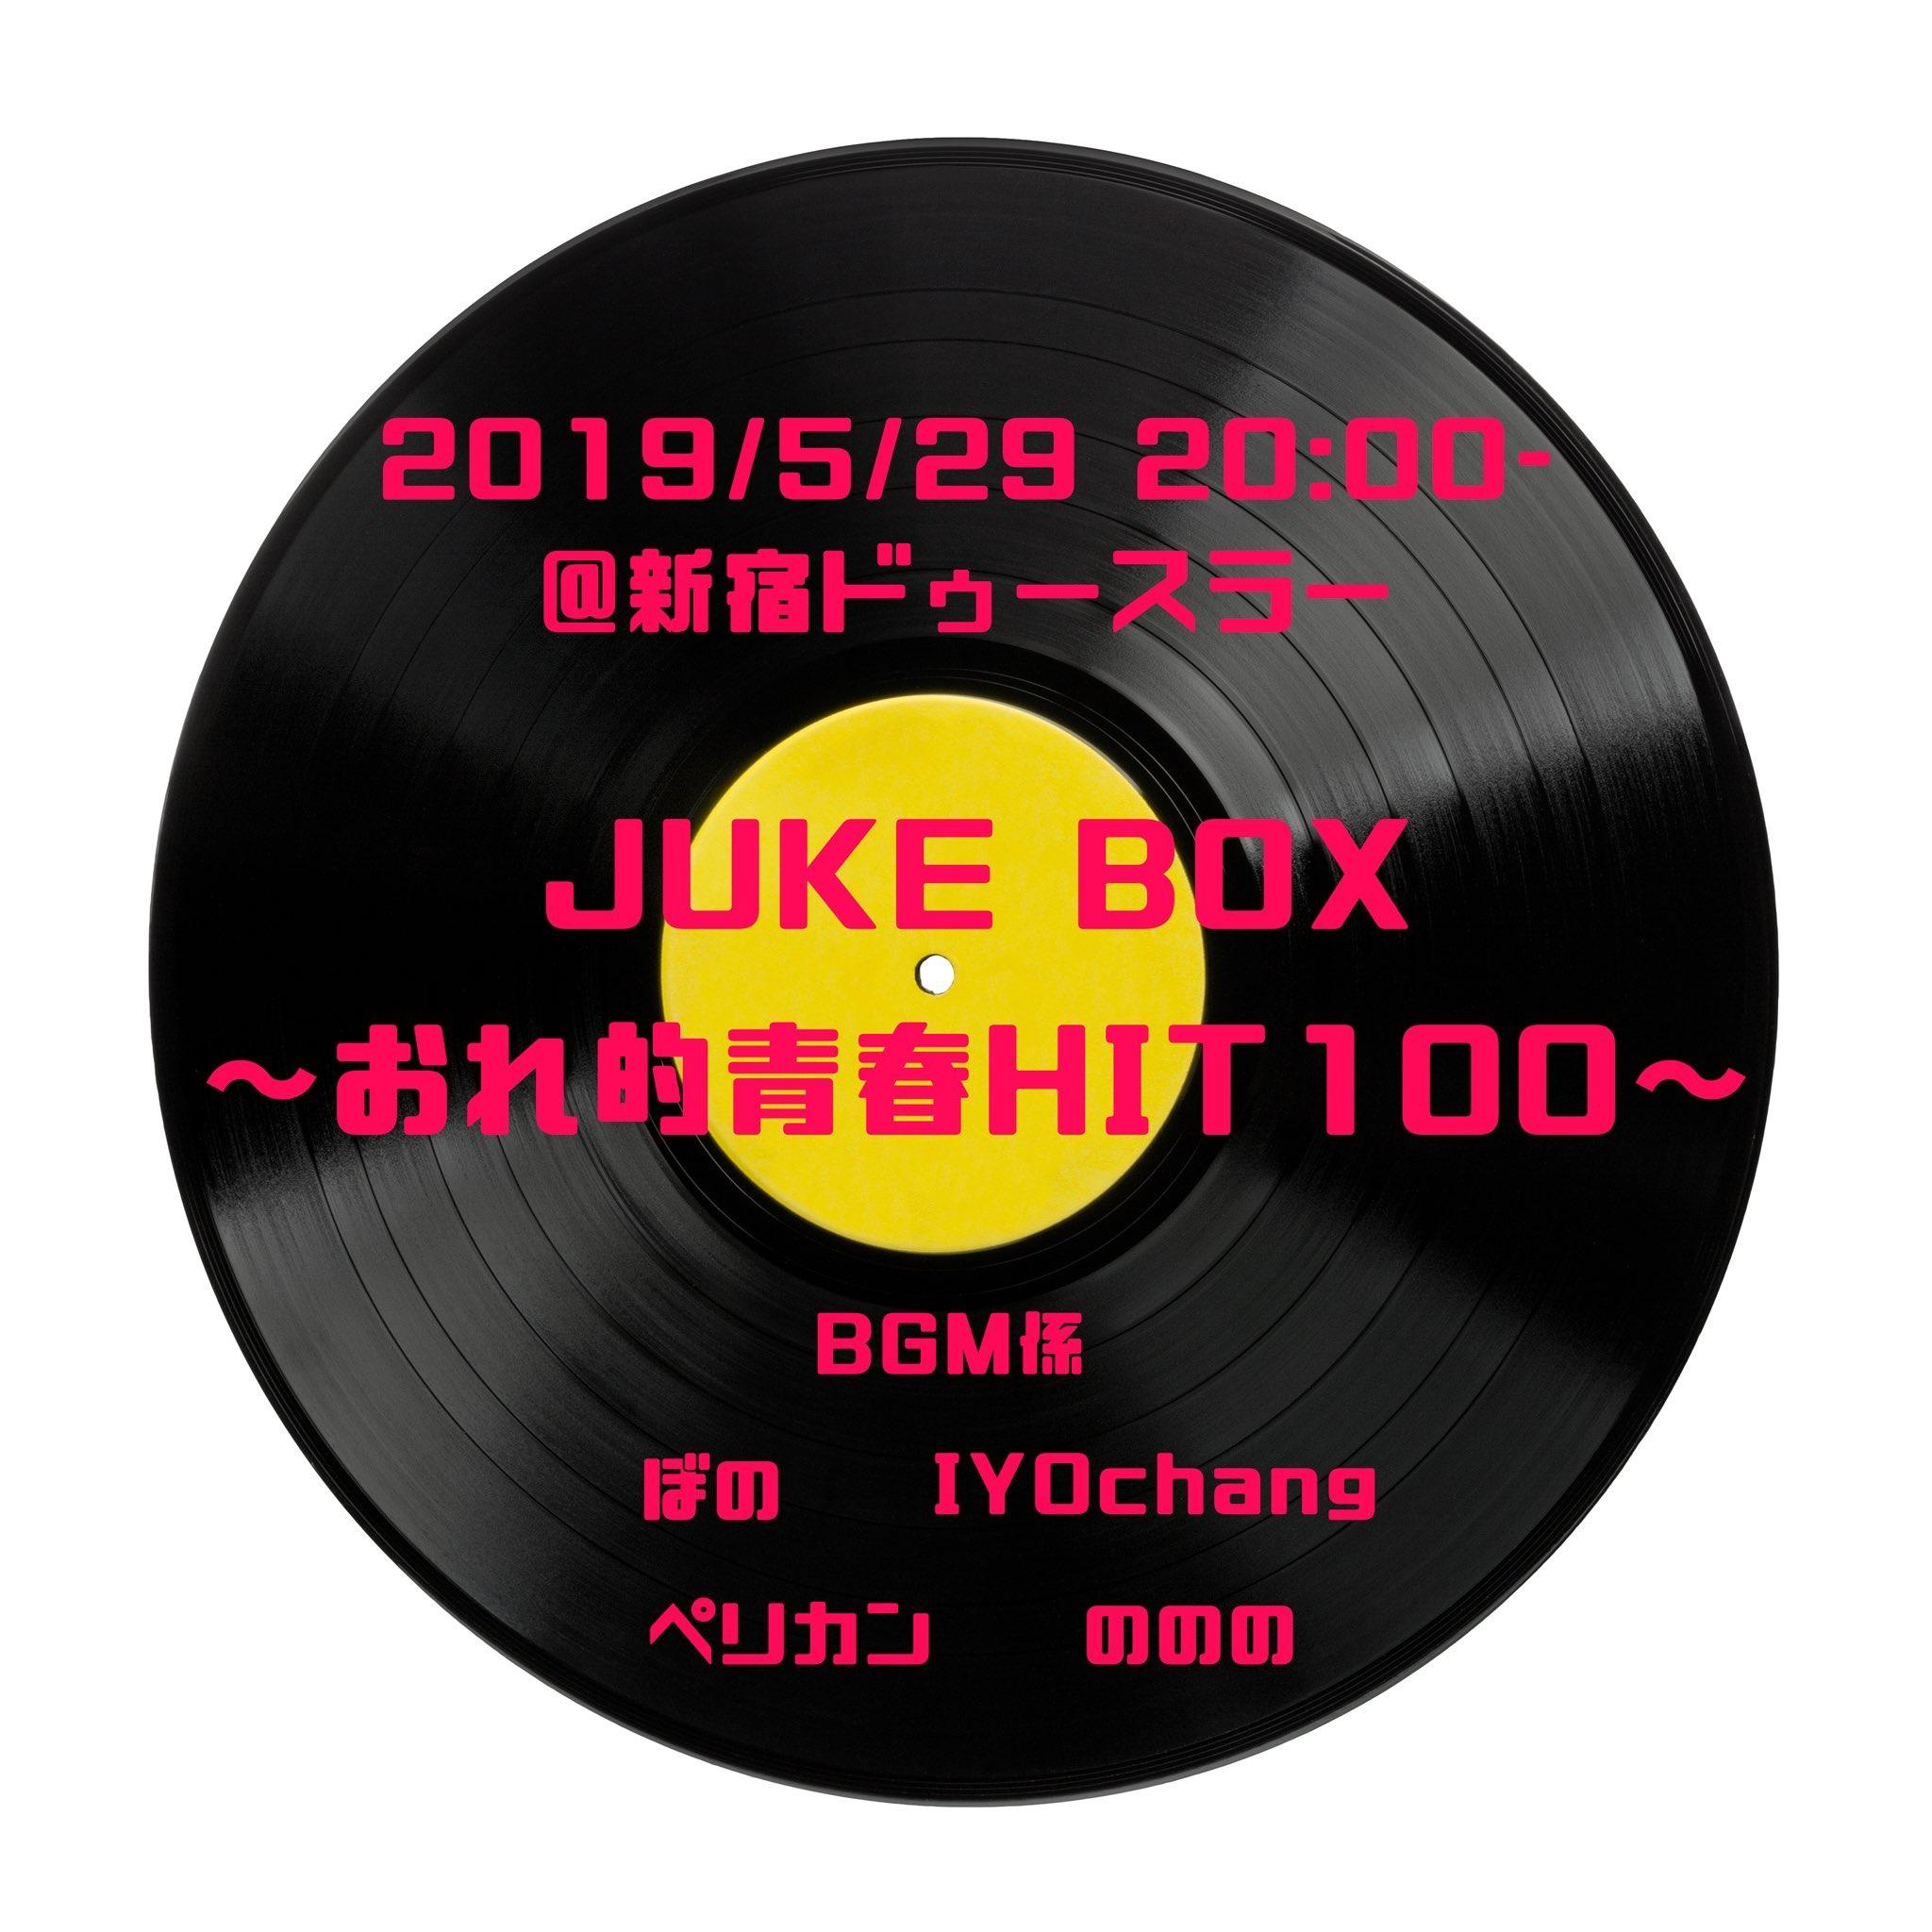 JUKE BOX 〜俺的青春HIT100〜